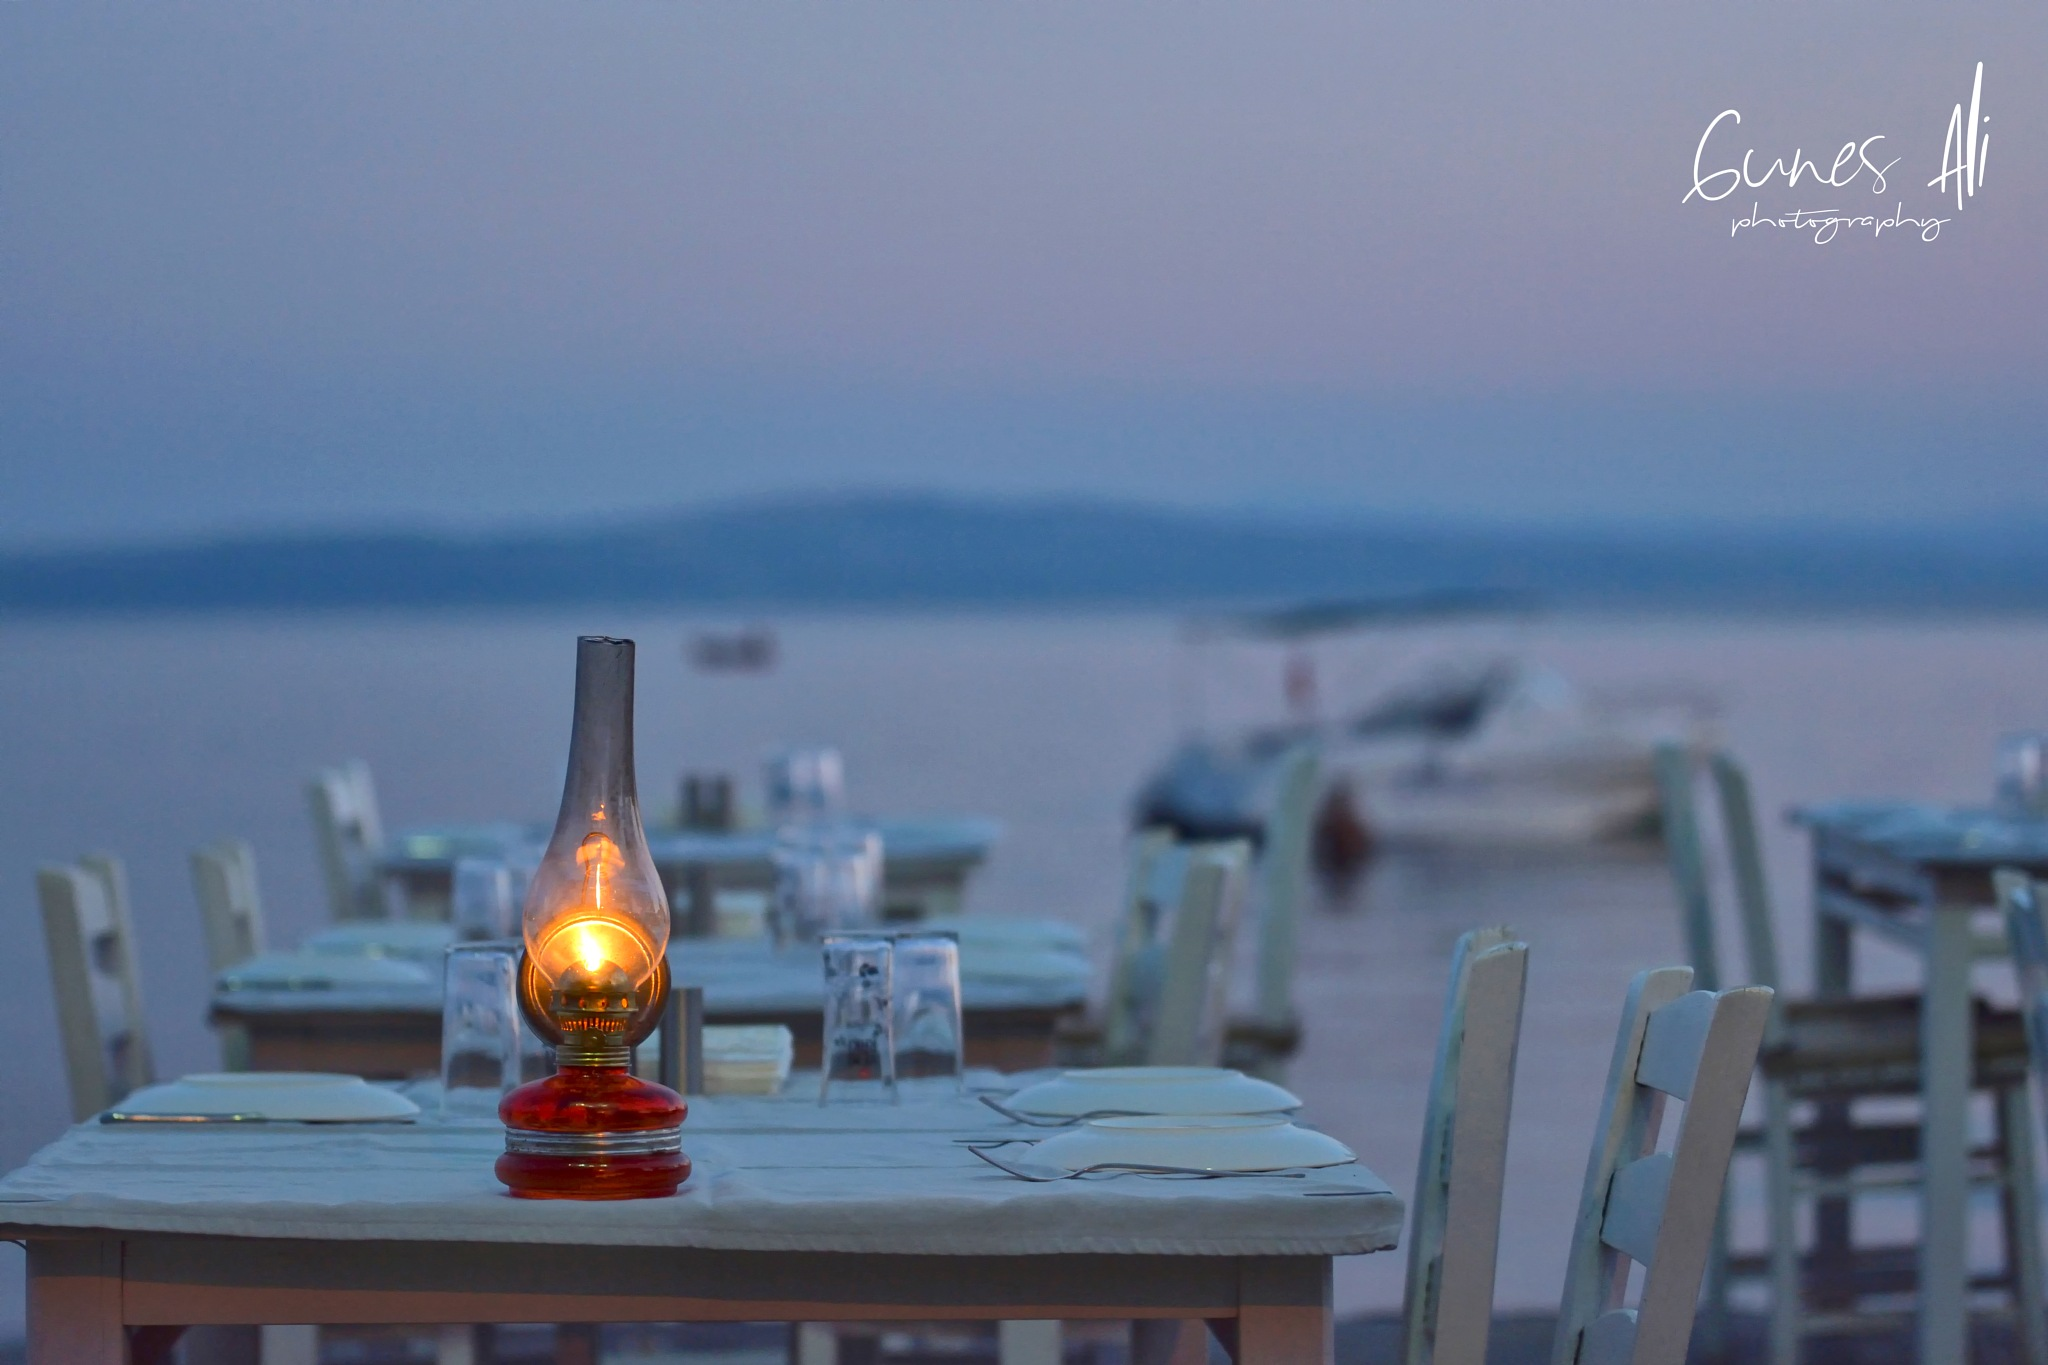 sahilde romantik bi masa by gunesali.photography